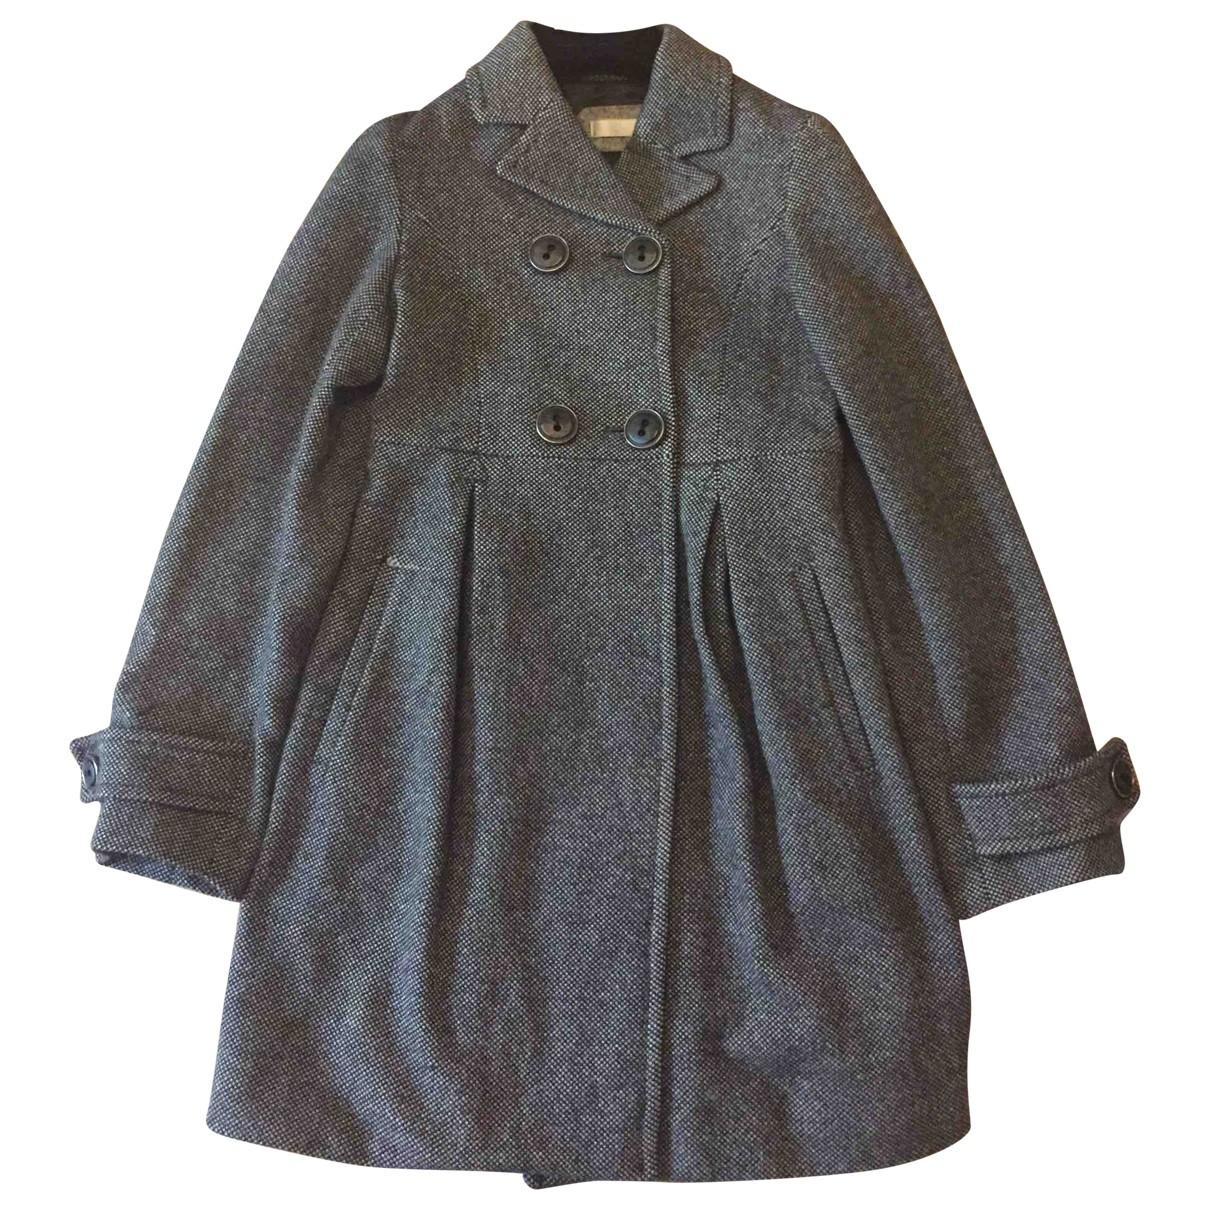 I Pinco Pallino \N Grey Wool jacket & coat for Kids 10 years - up to 142cm FR